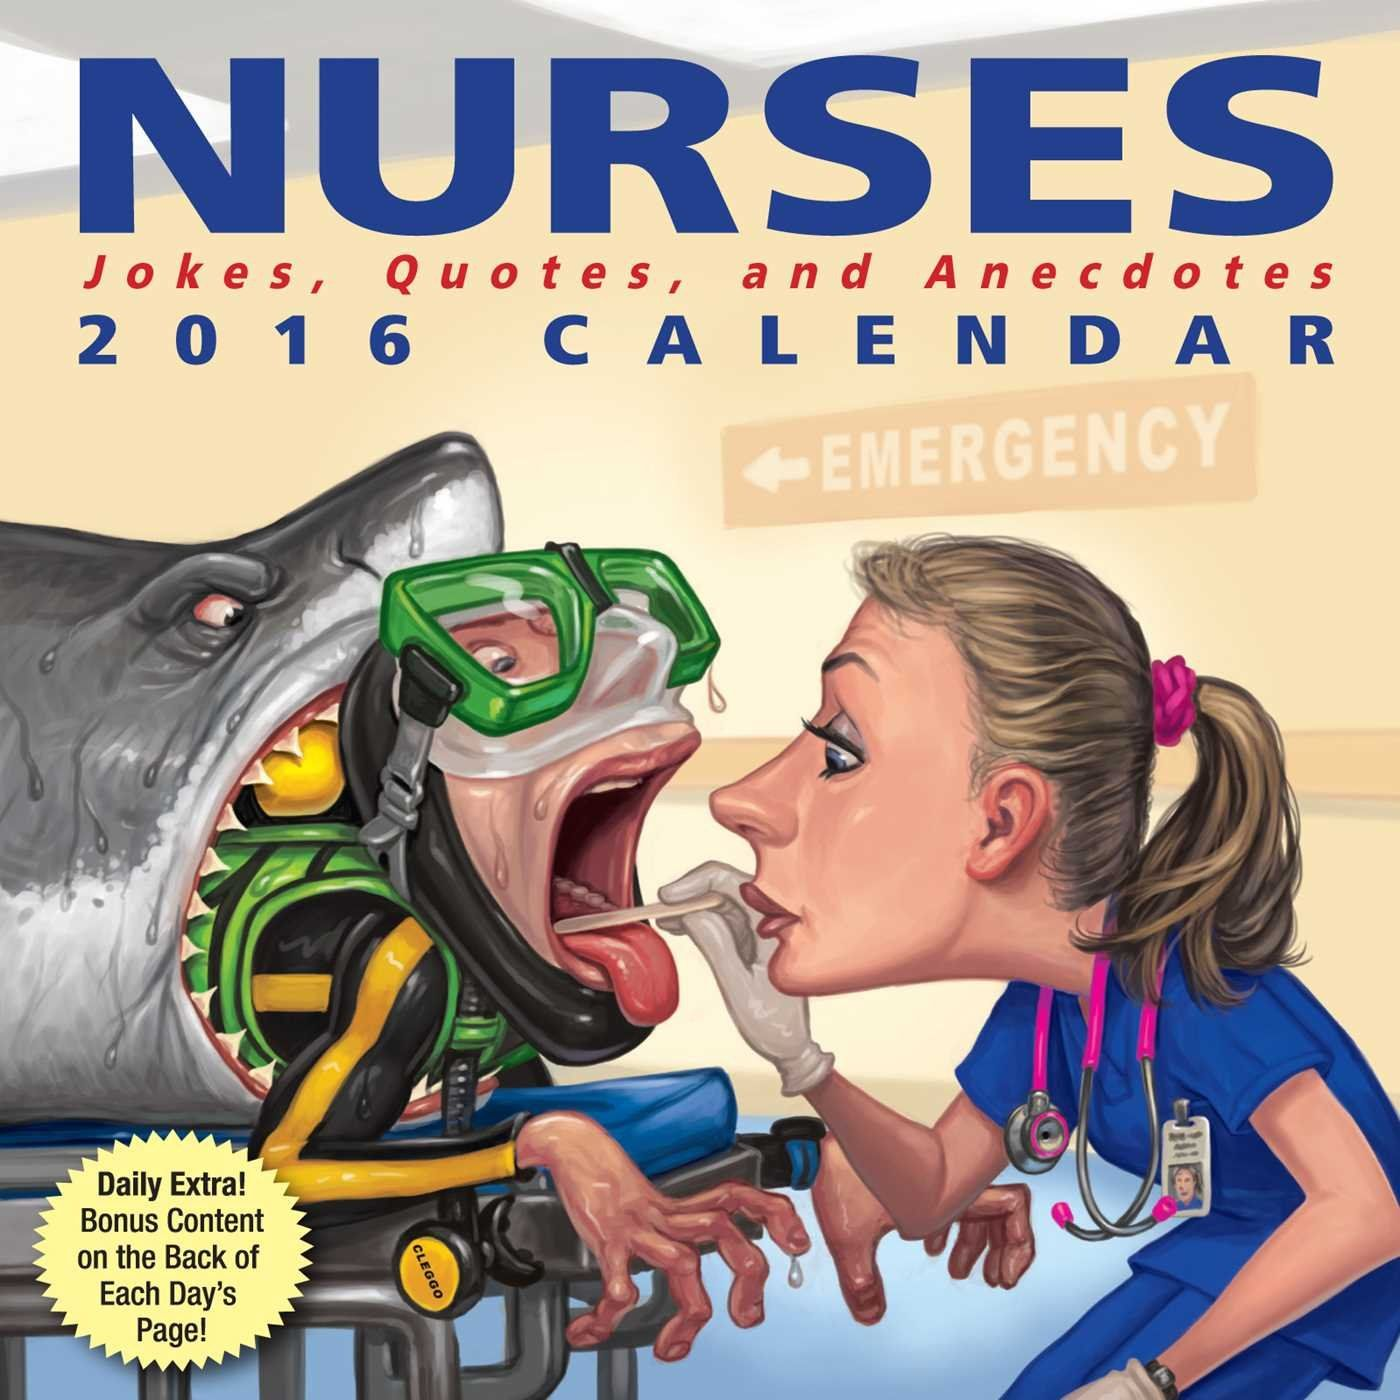 Top 10 Best Funny DaytoDay Calendars 2020 Nurse jokes